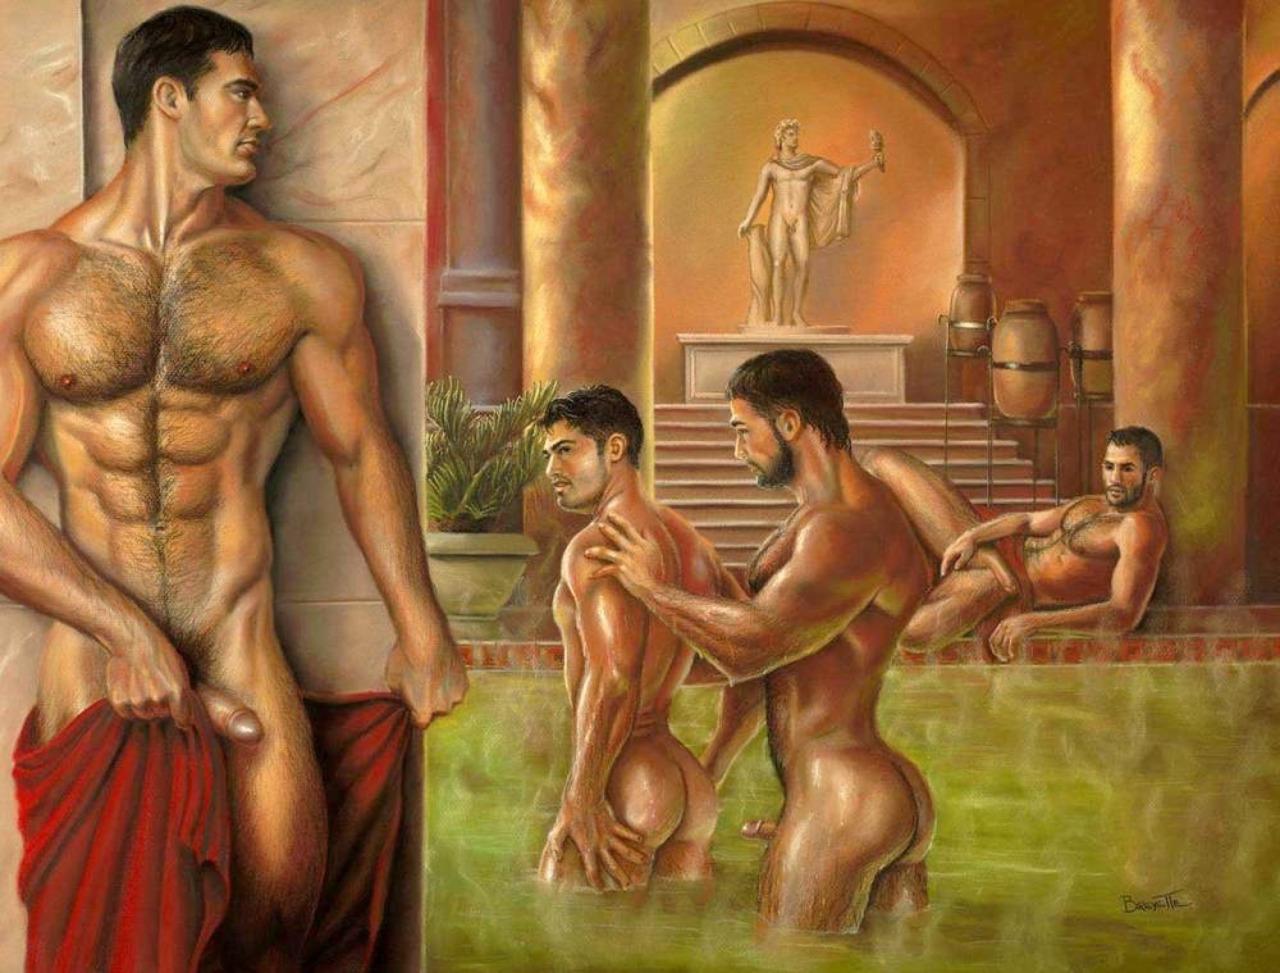 Hyper Sexual Carnival